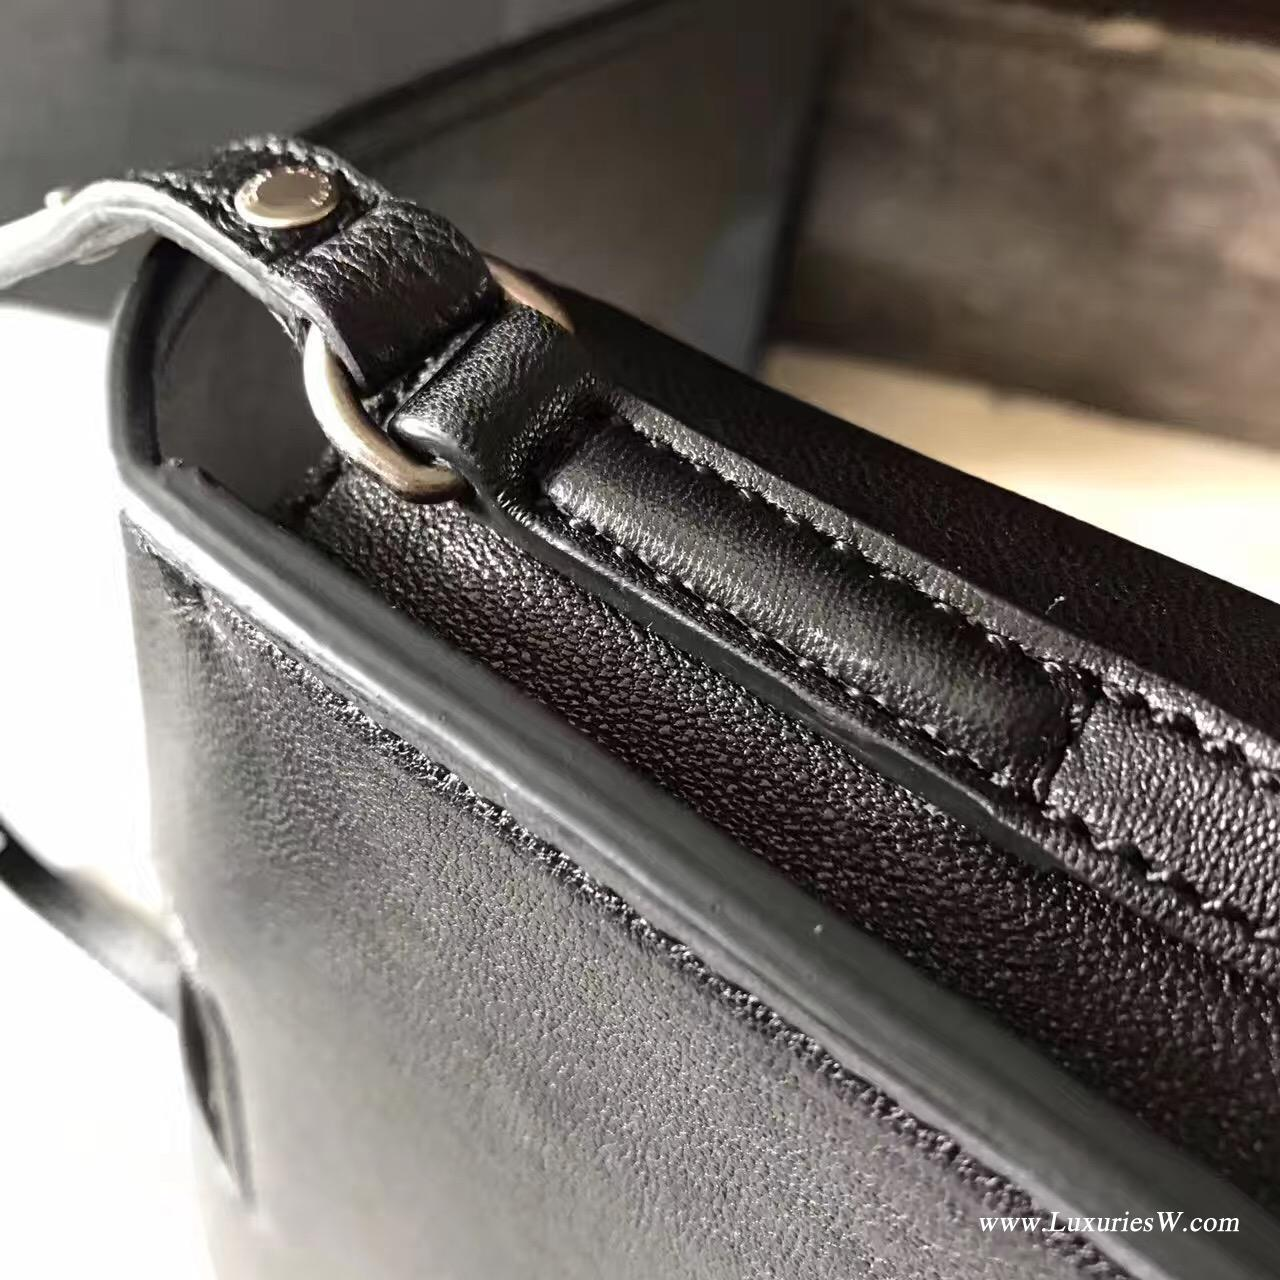 聖羅蘭YSL 小号黑色羊皮CHARLOTTE斜跨包 SAINT LAURENT挎包